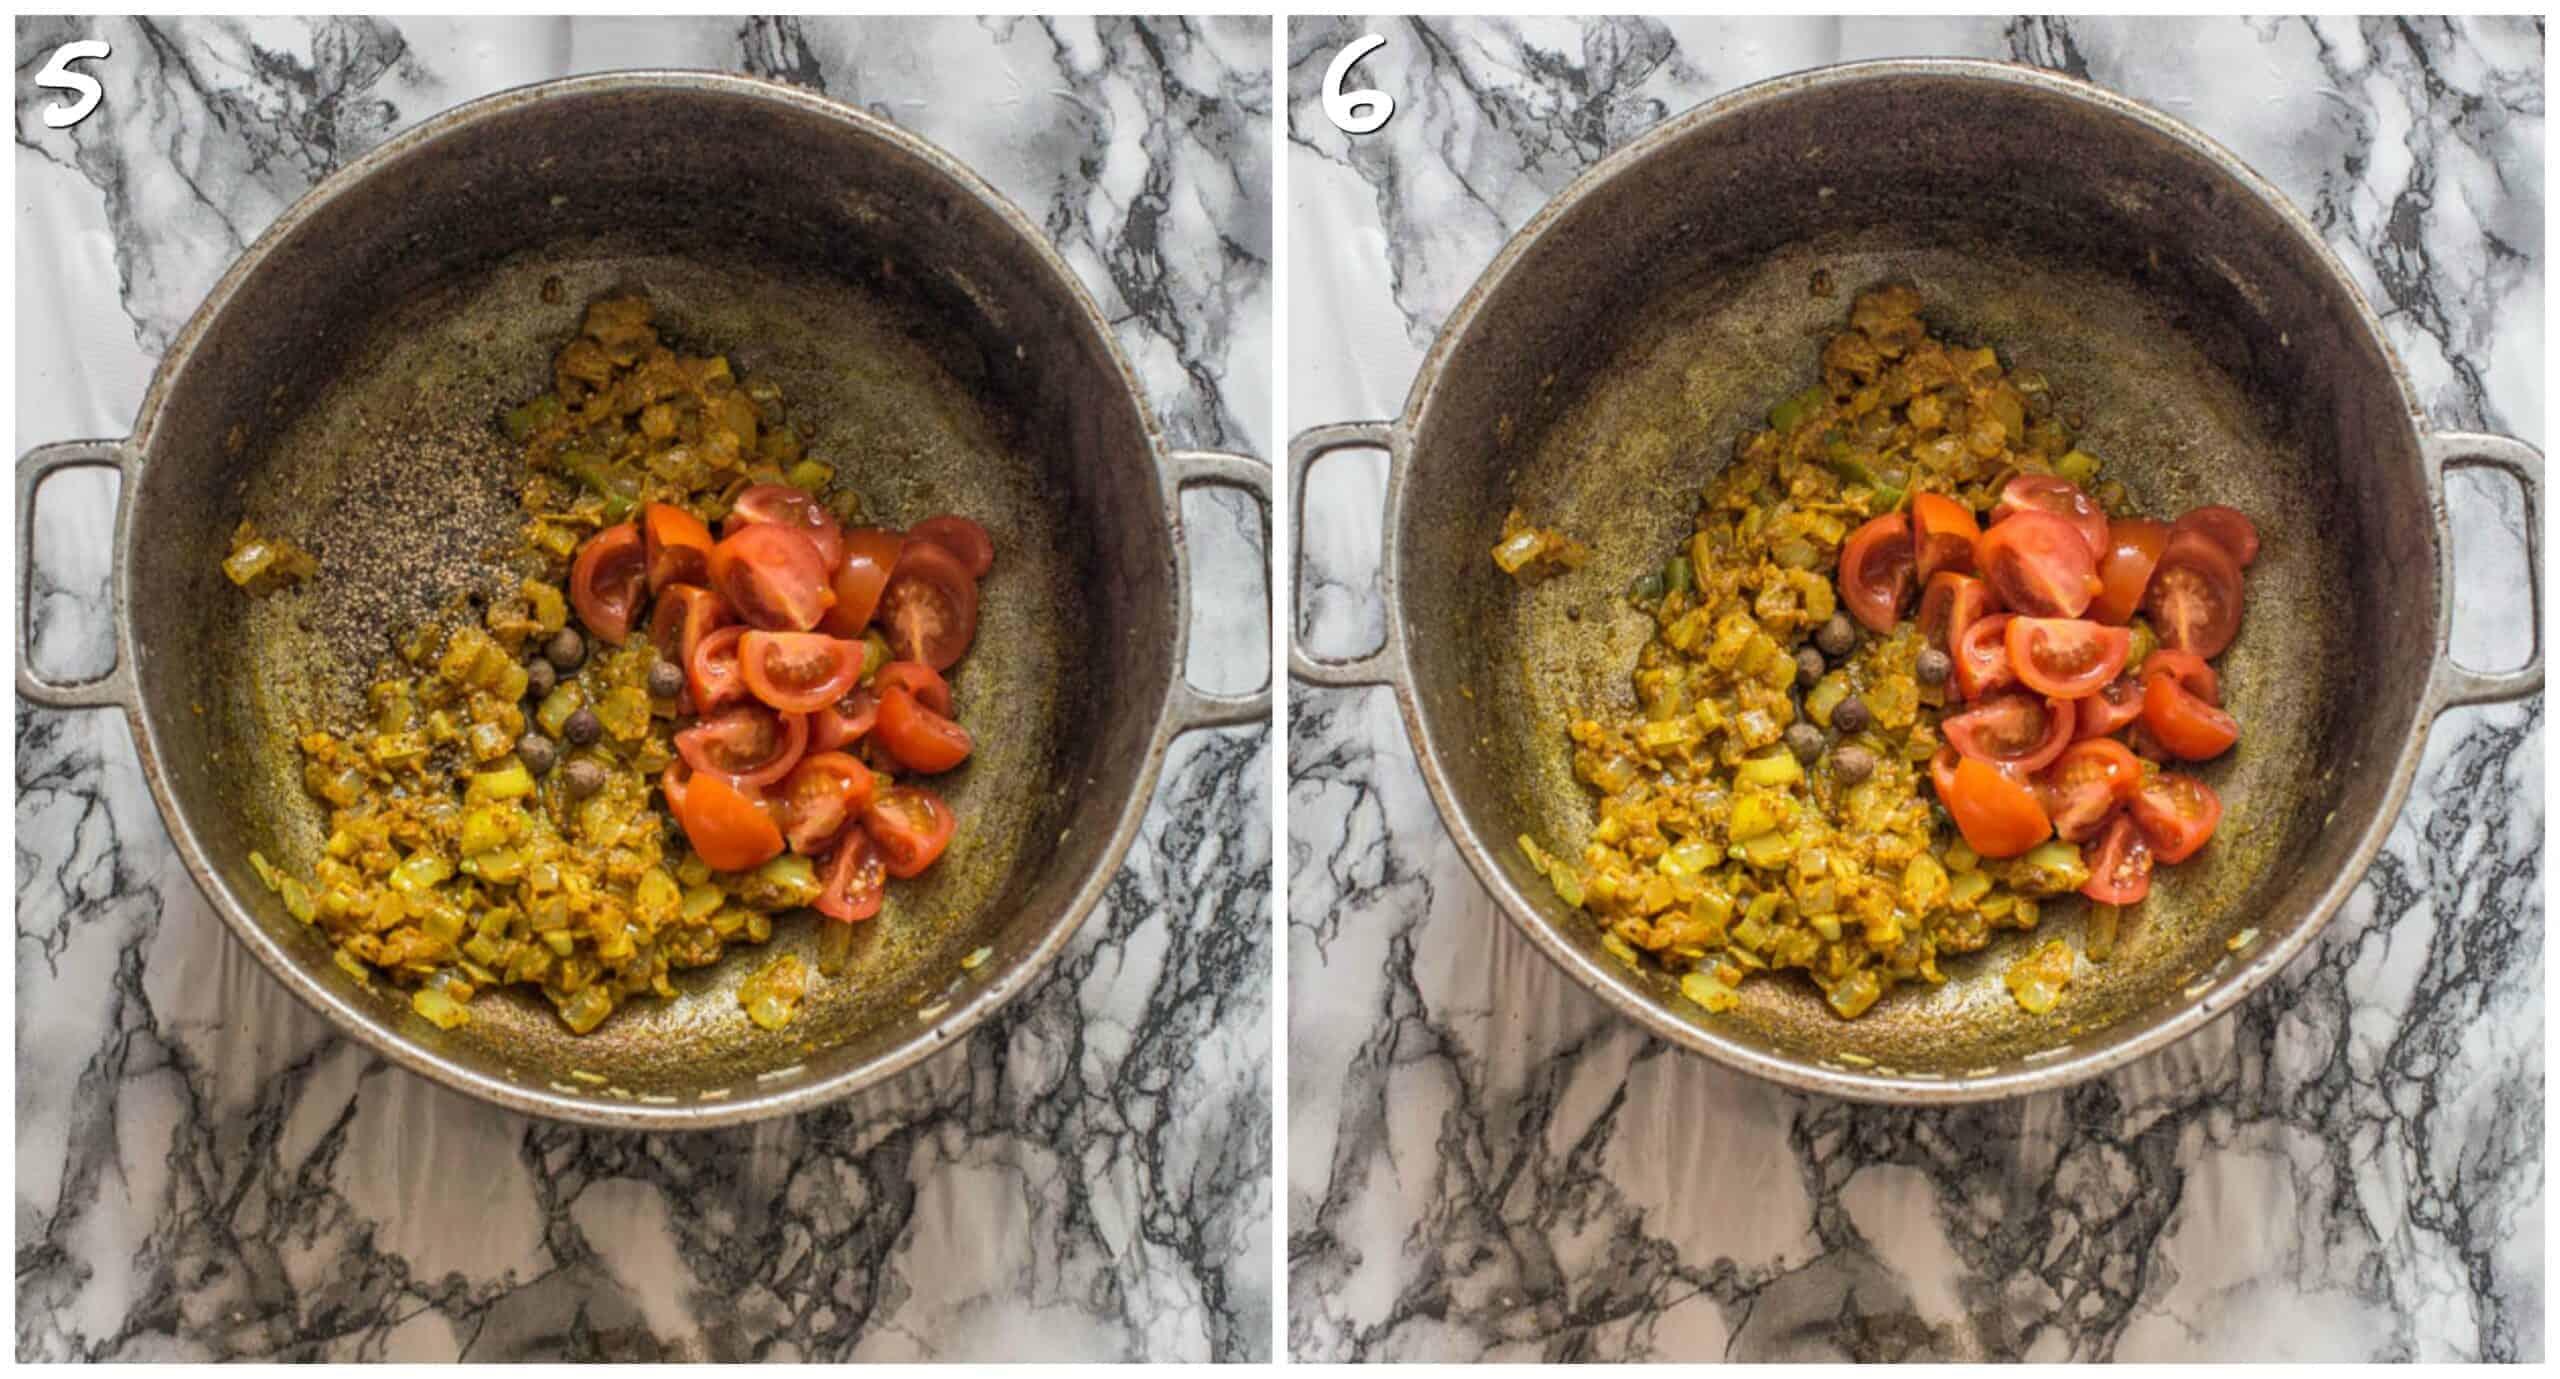 steps 5-6 adding black pepper and pimento